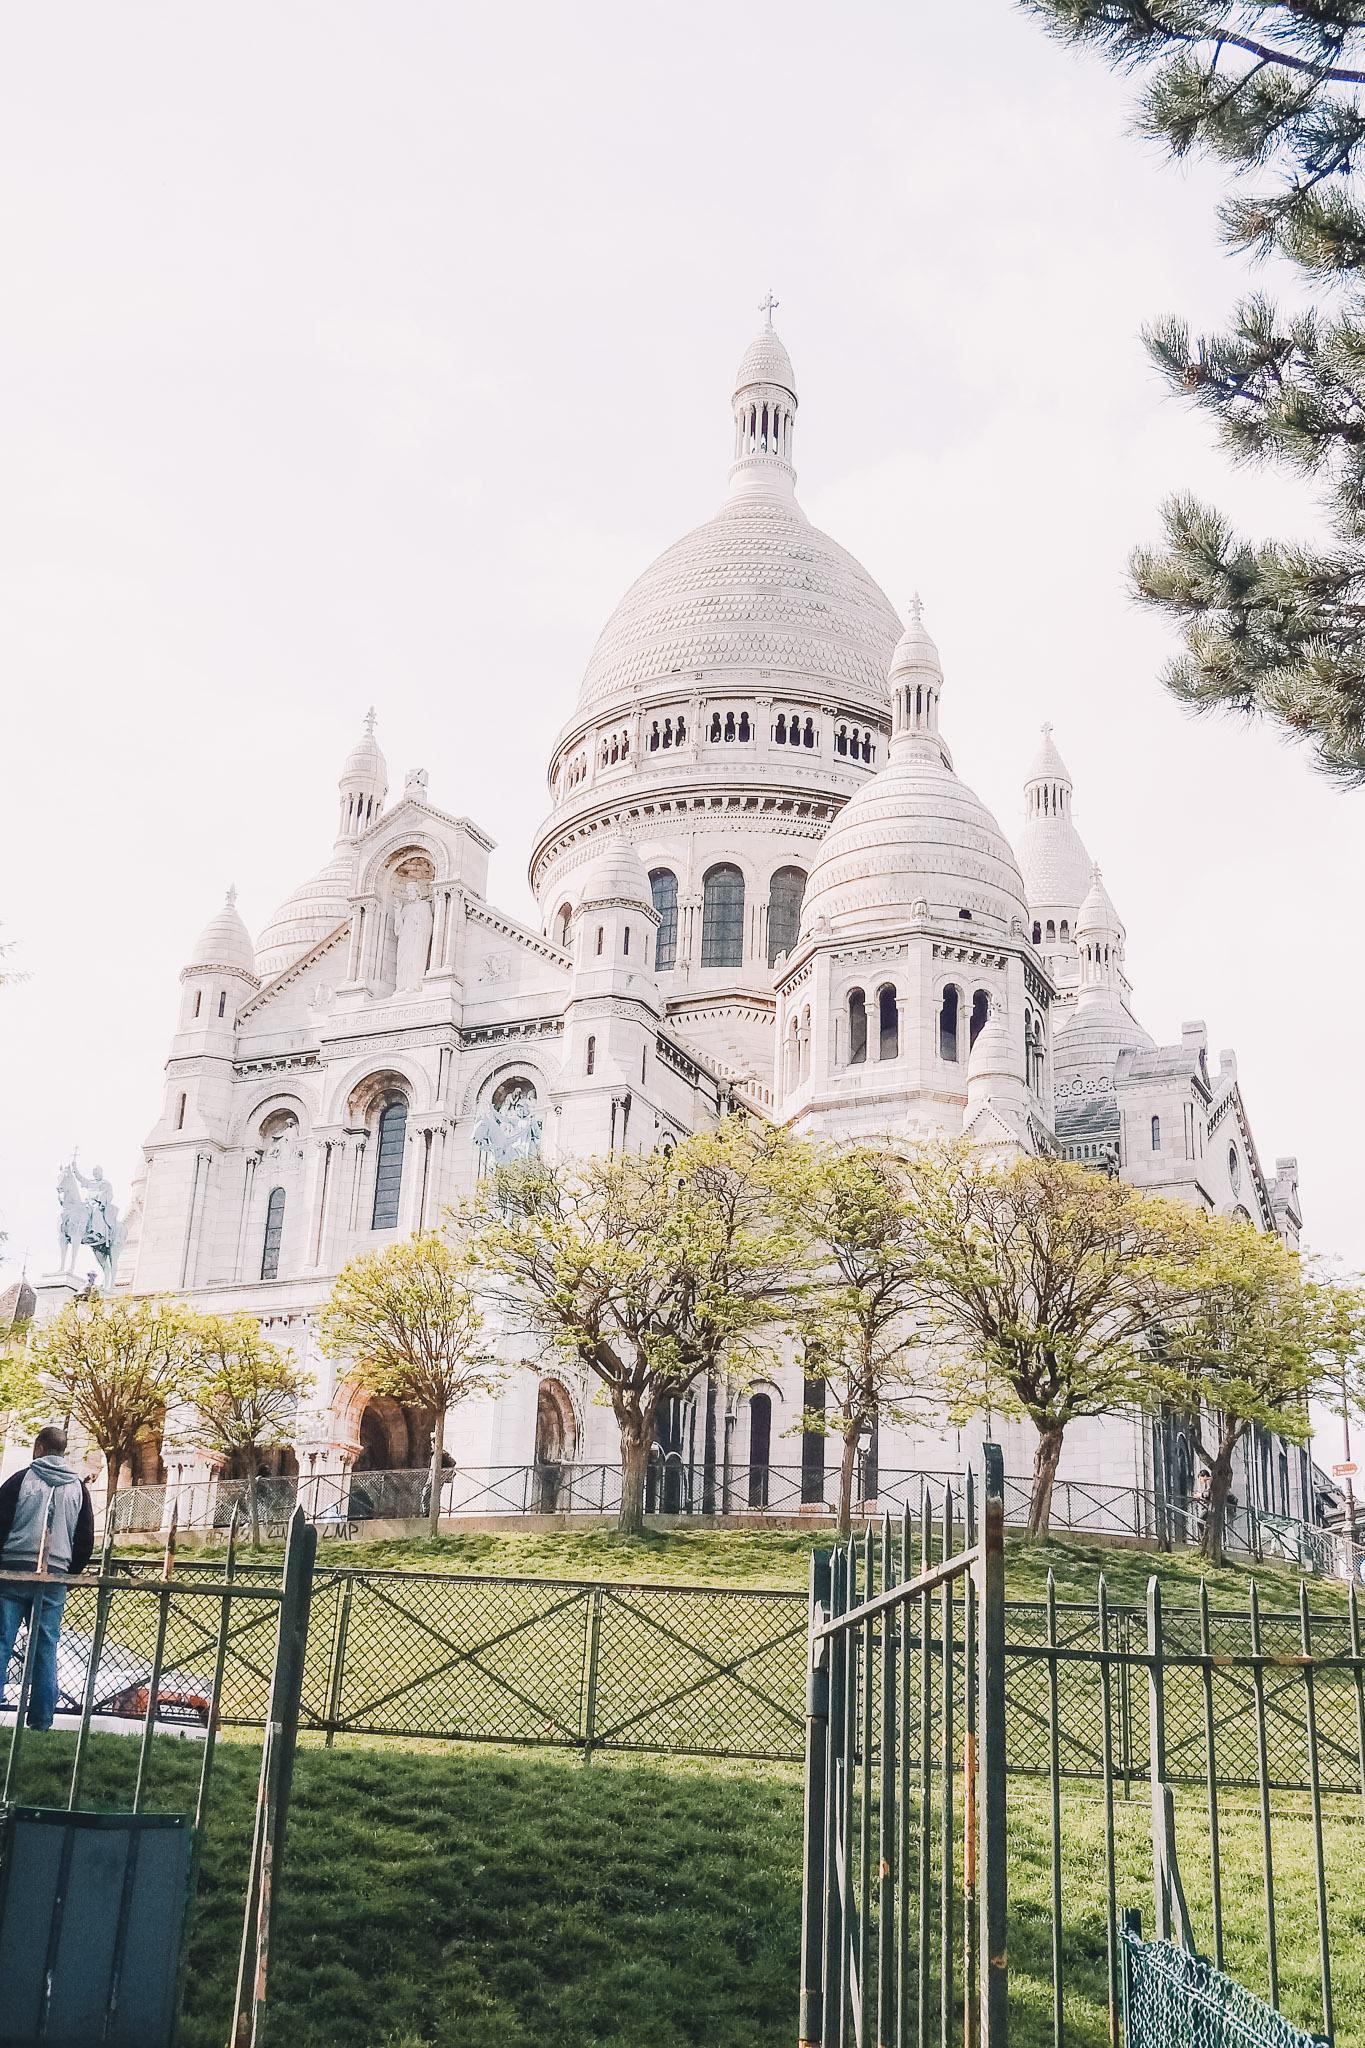 france-paris-2013-10-sacre-coeur.jpg